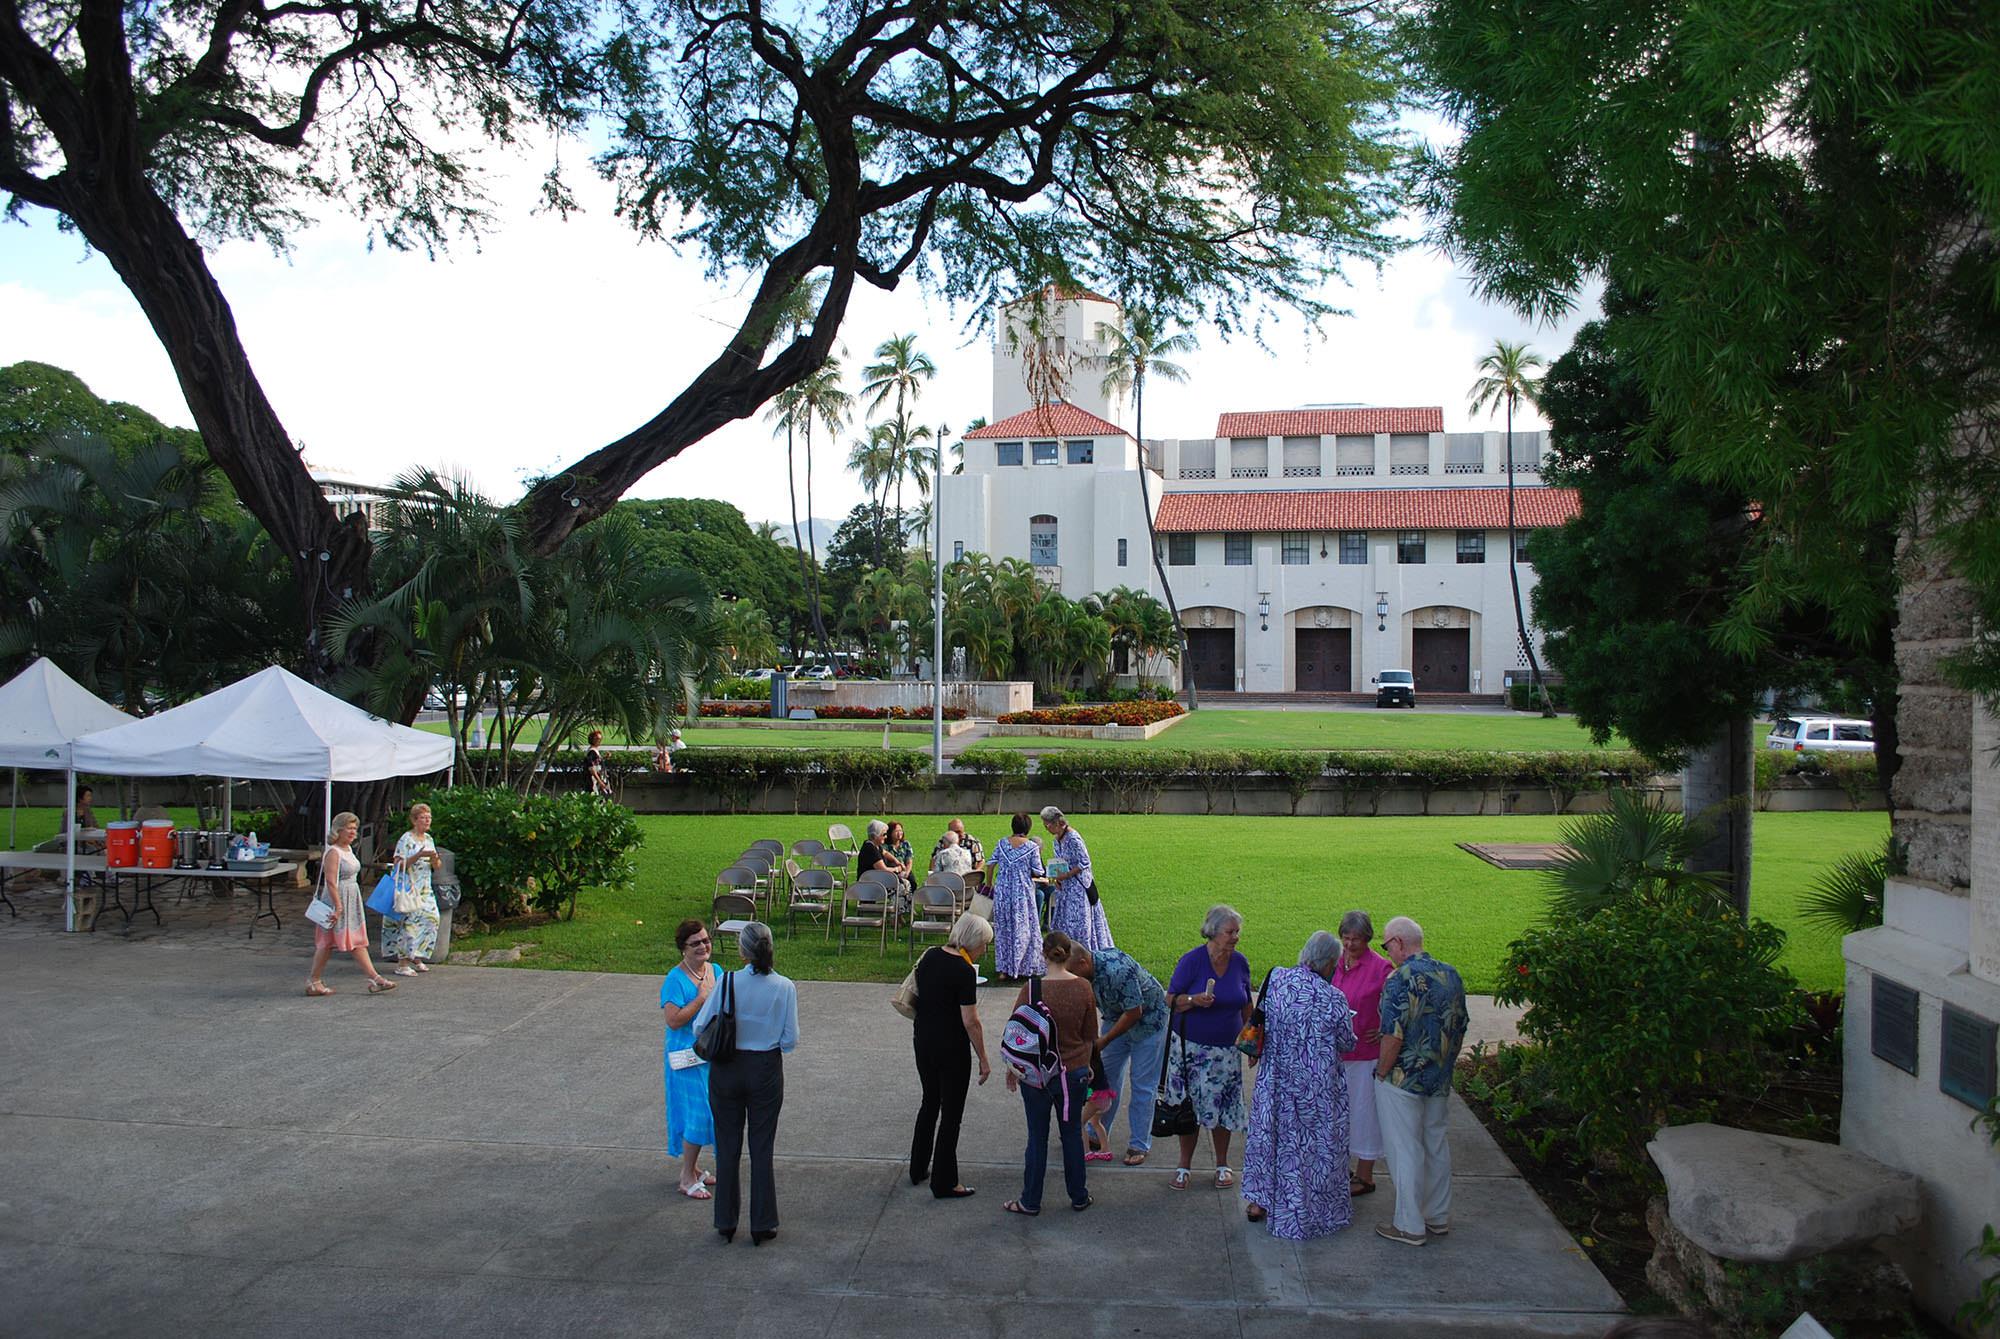 Fig. 13 Honolulu City Hall, Oʻahu, as seen from front steps of Kawaiahaʻo Church during Sunday coffee hour, February 2014. Photo: ©Sally Promey